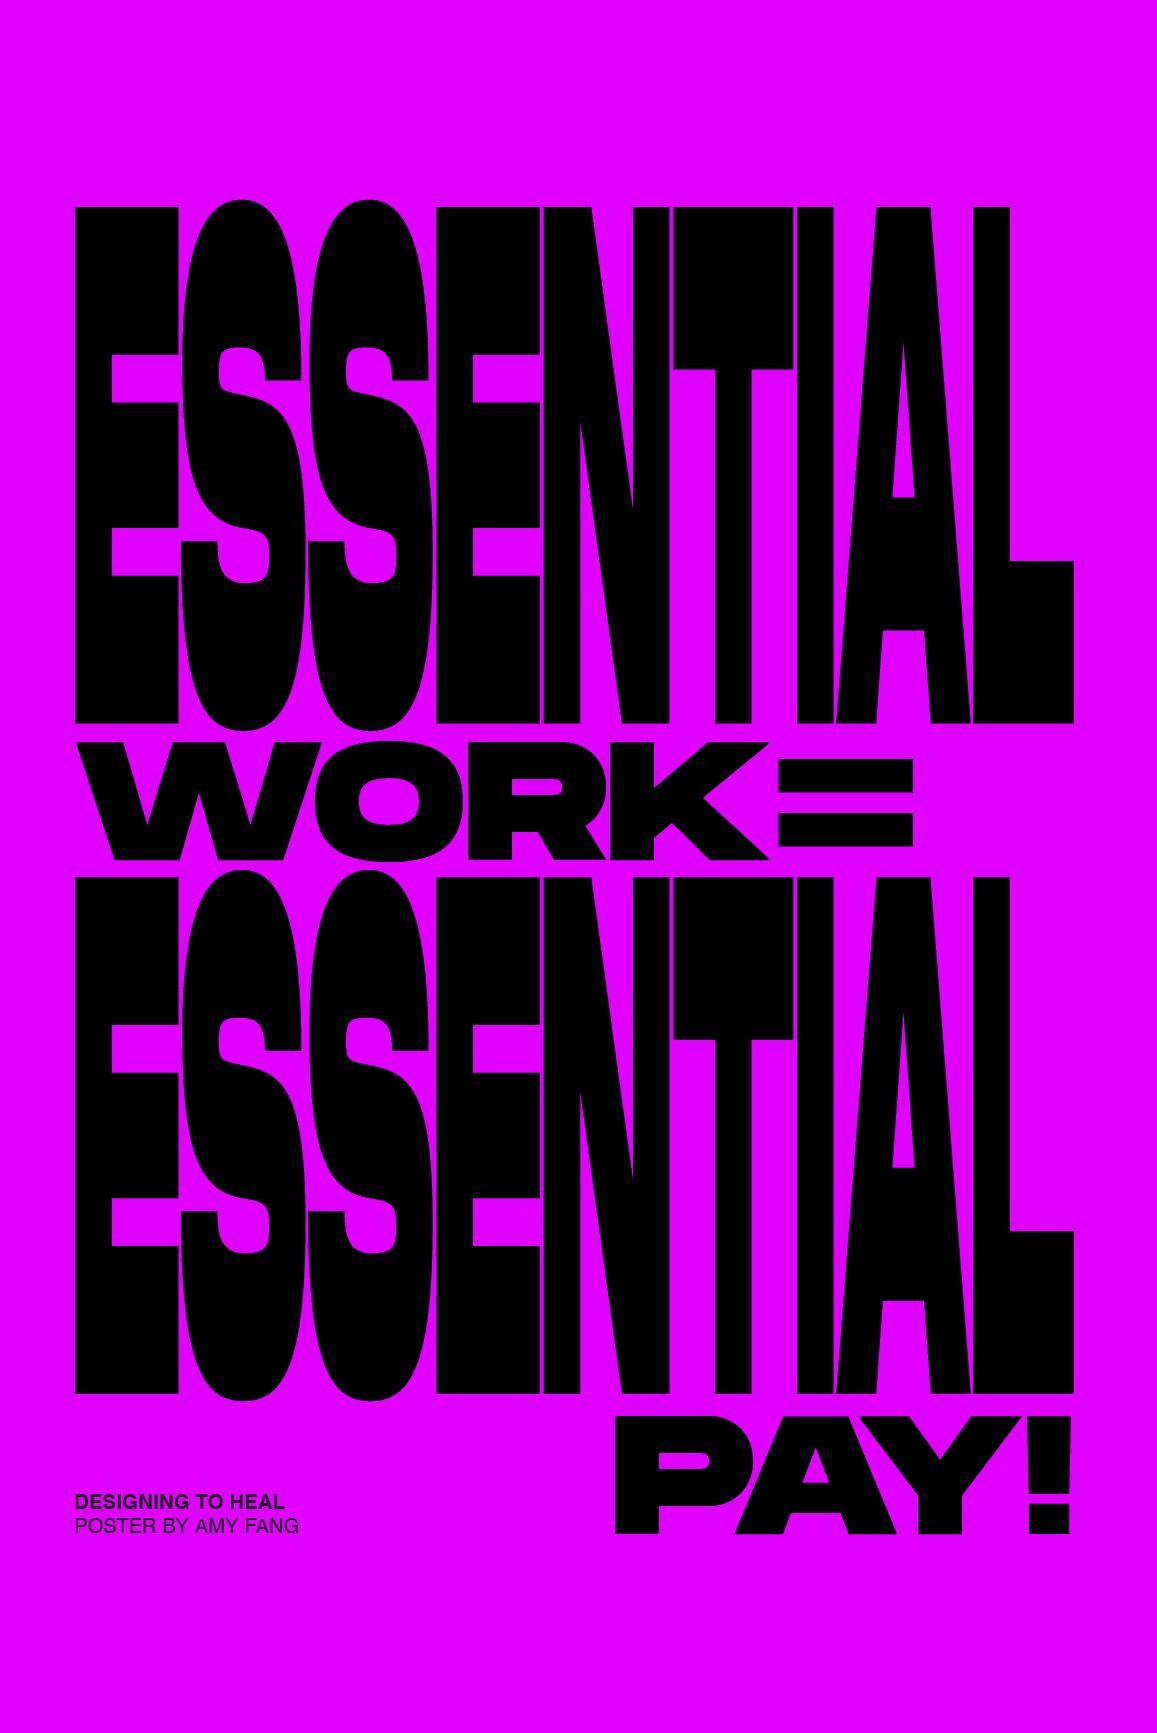 Essential Work = Essential Pay!